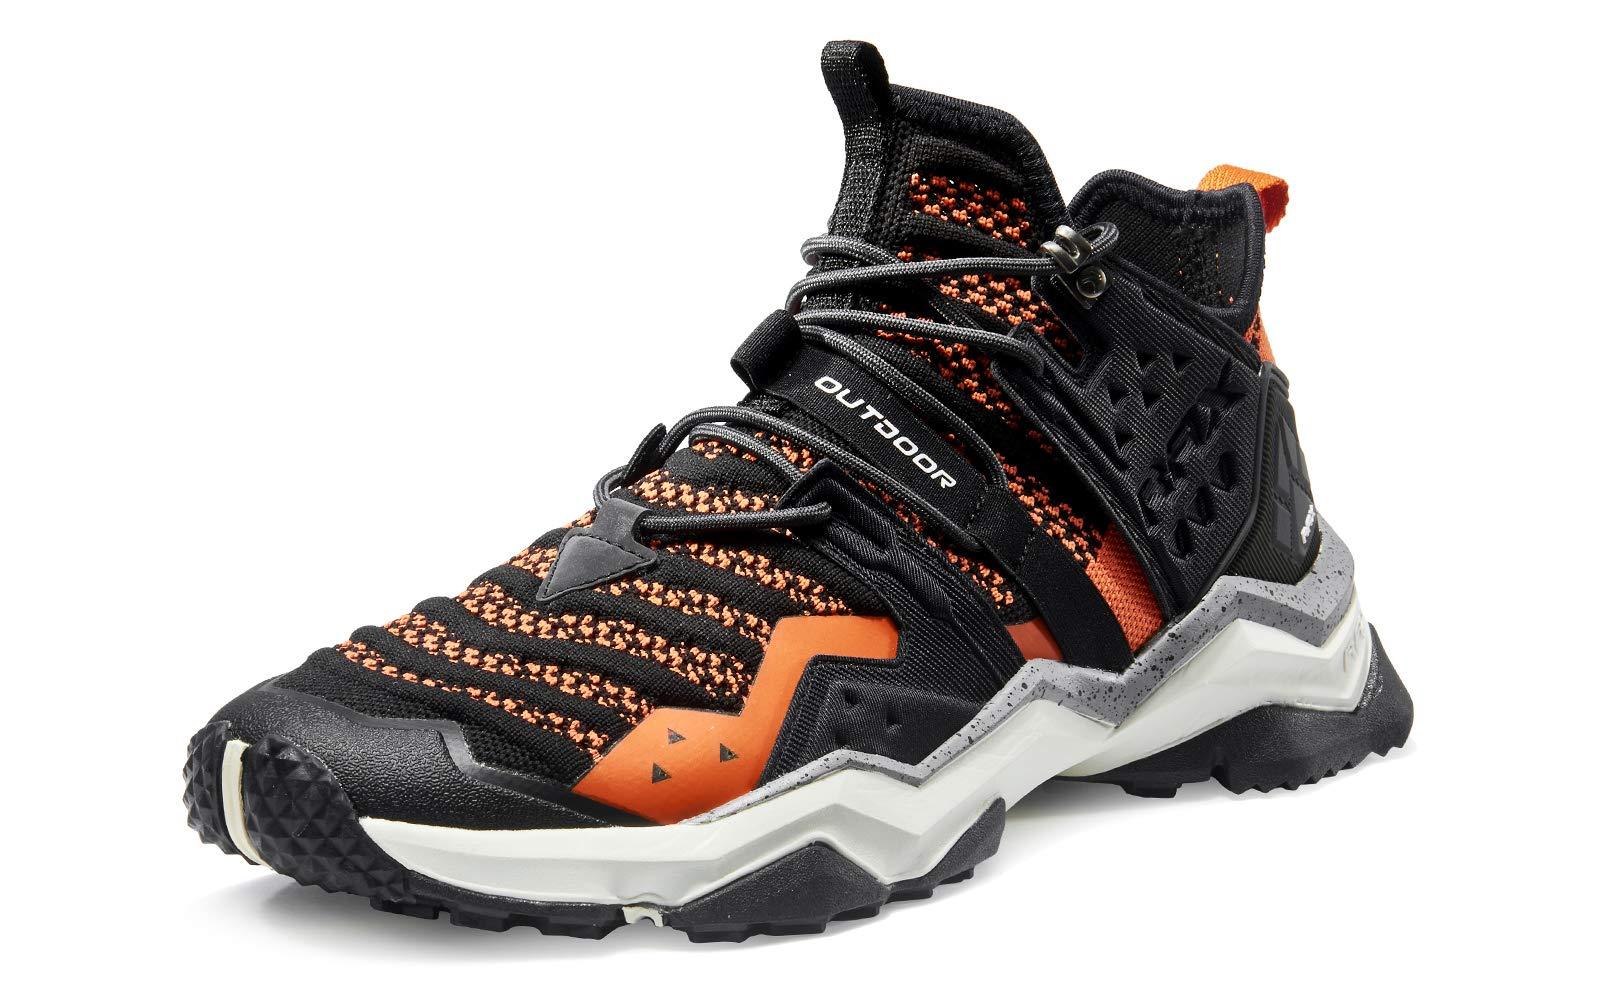 men's lightweight hiking shoes